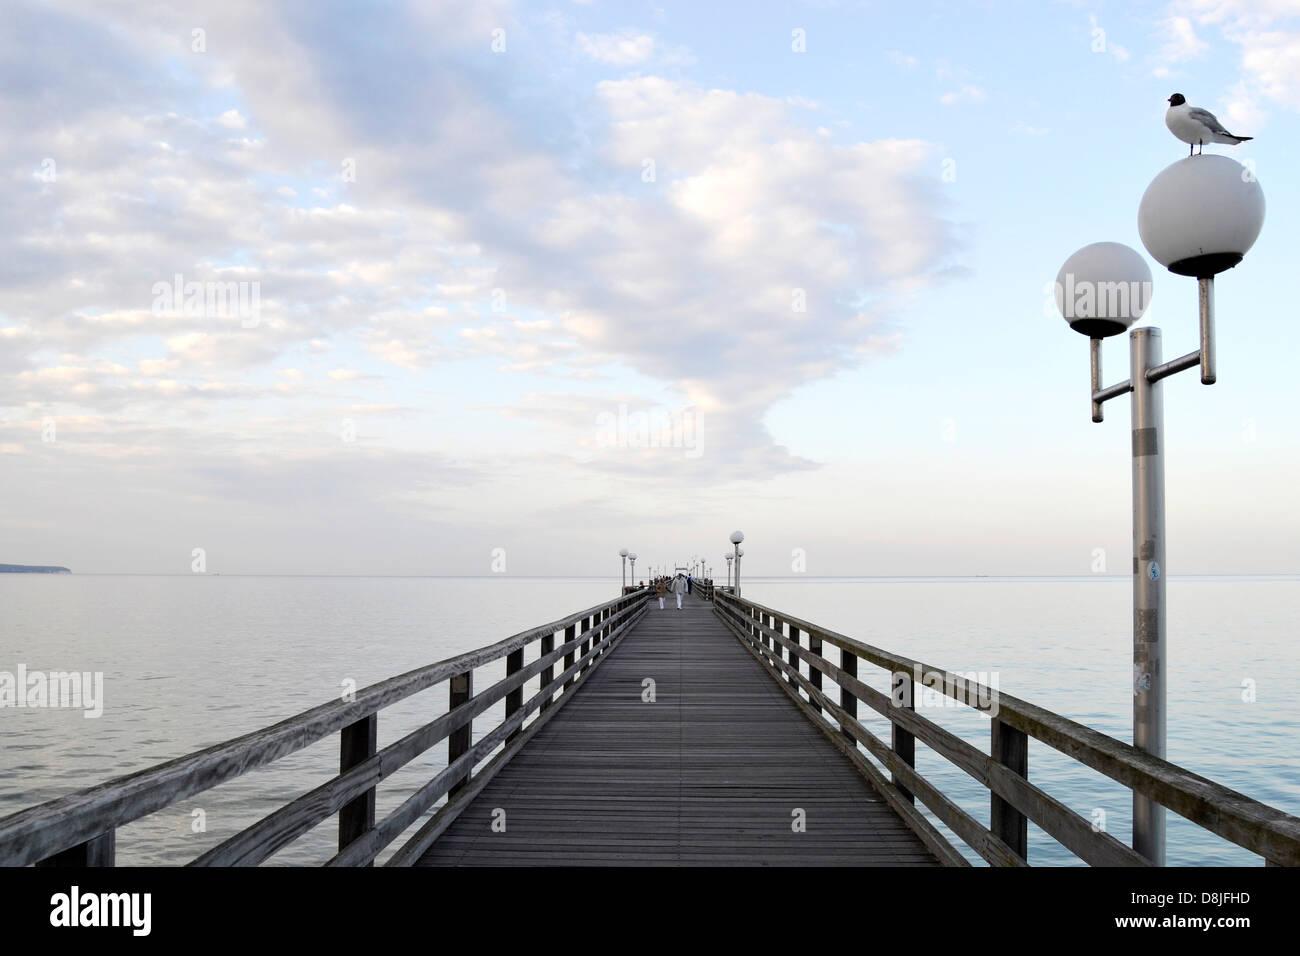 Pier in the evening, Binz, Ruegen Island, Germany Stock Photo